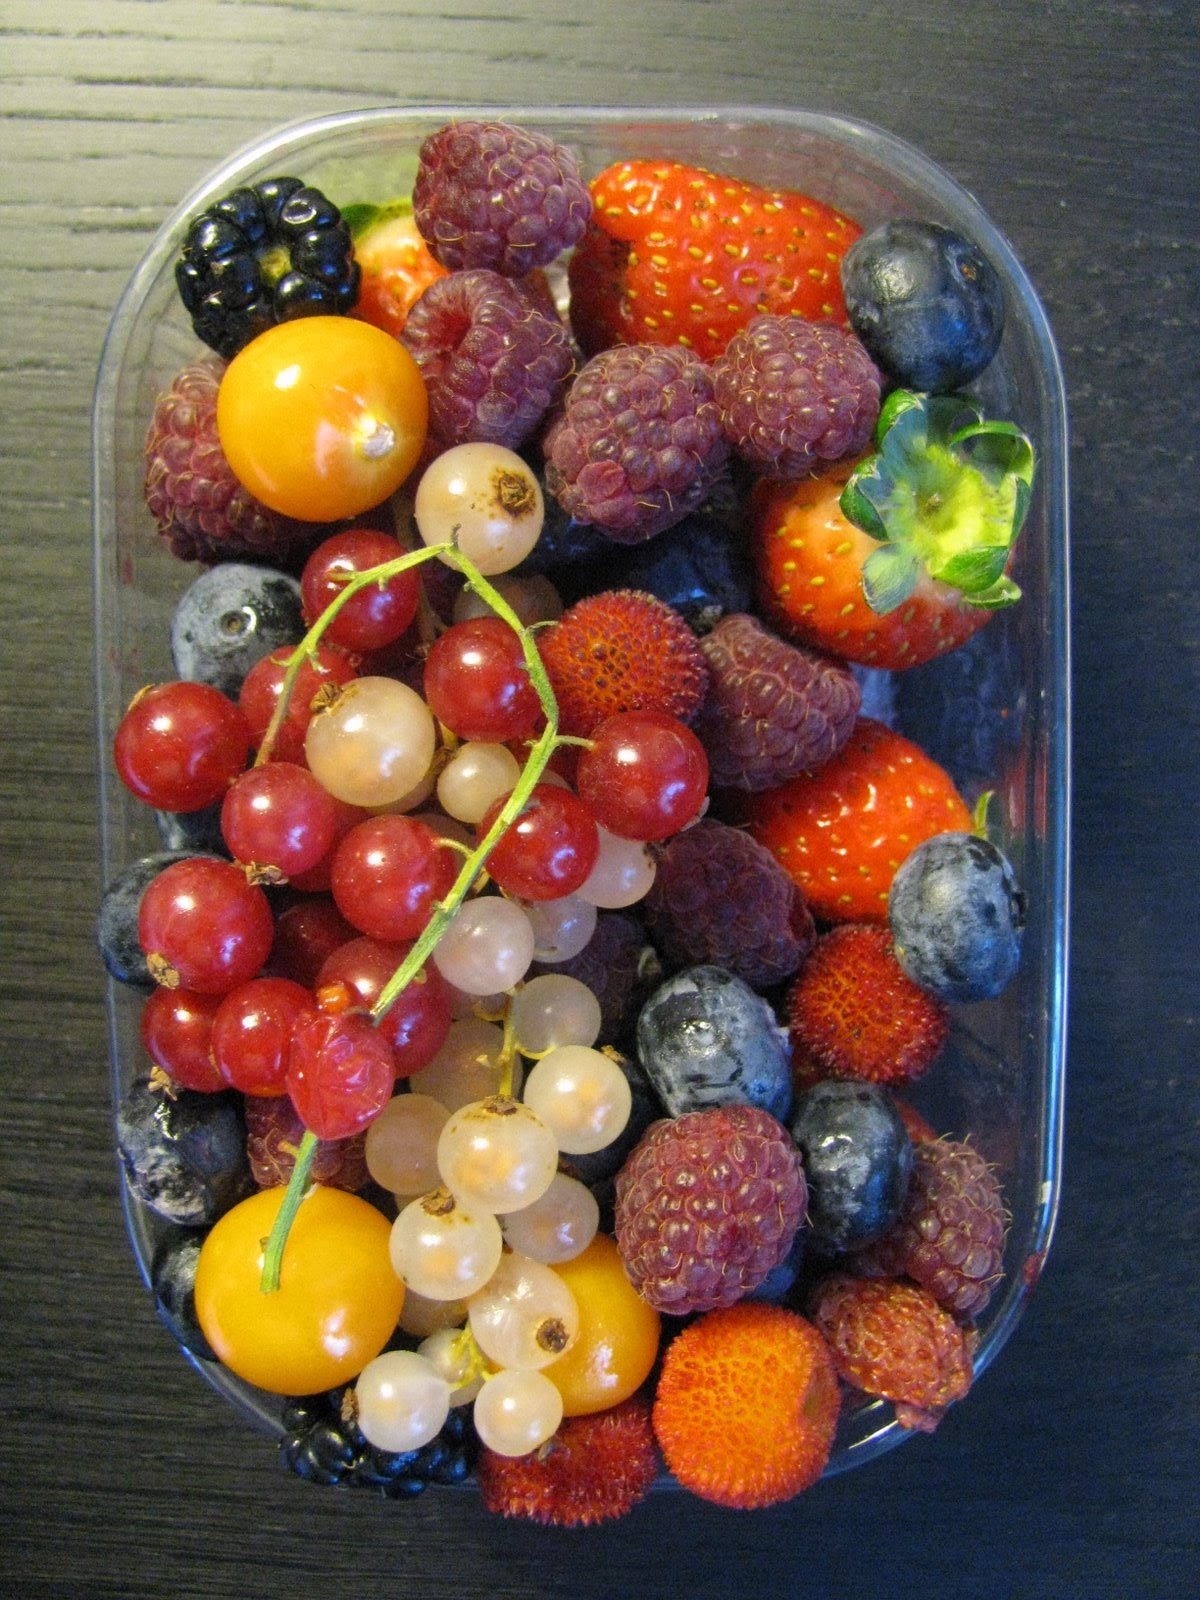 Fruit in Barcelona